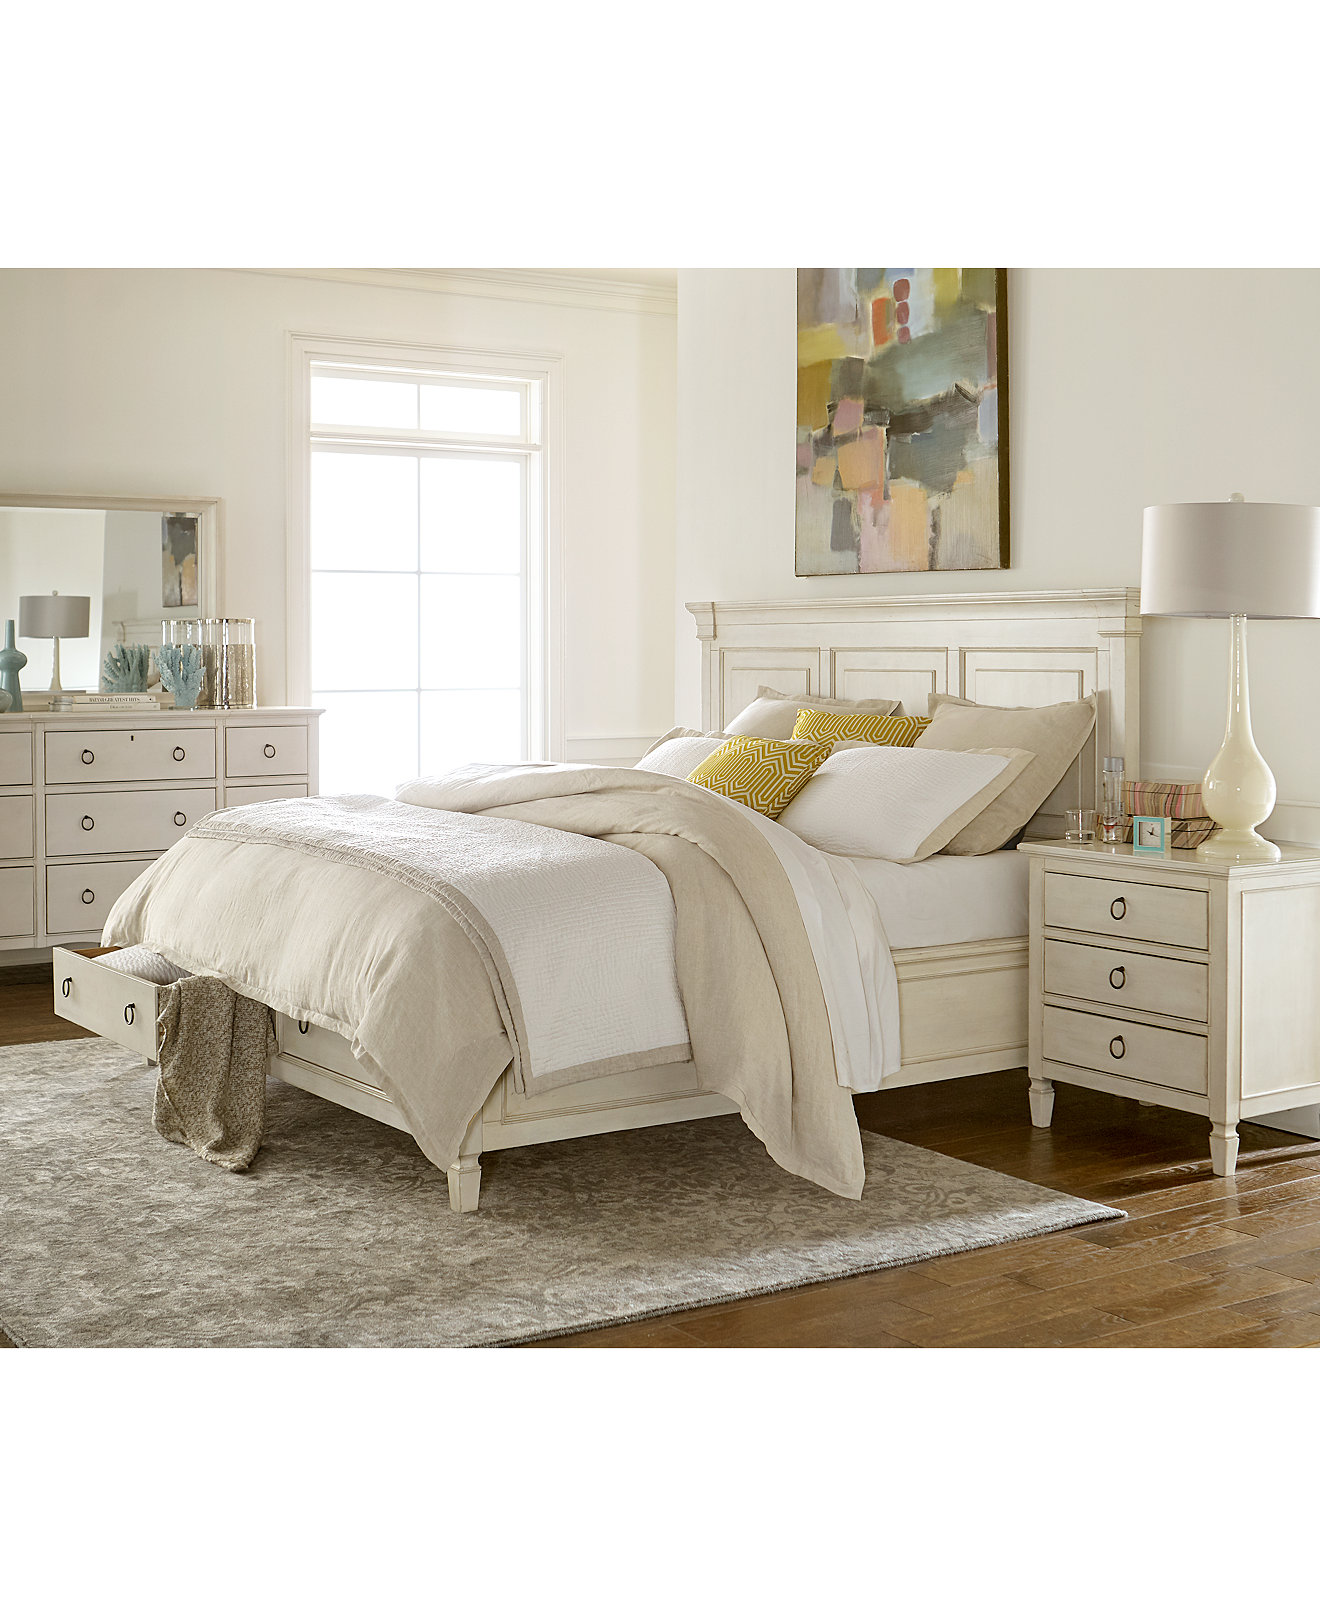 Macys Furniture Outlet Denver: What Bedroom Furniture We Need For A Bedroom ? Extravagant